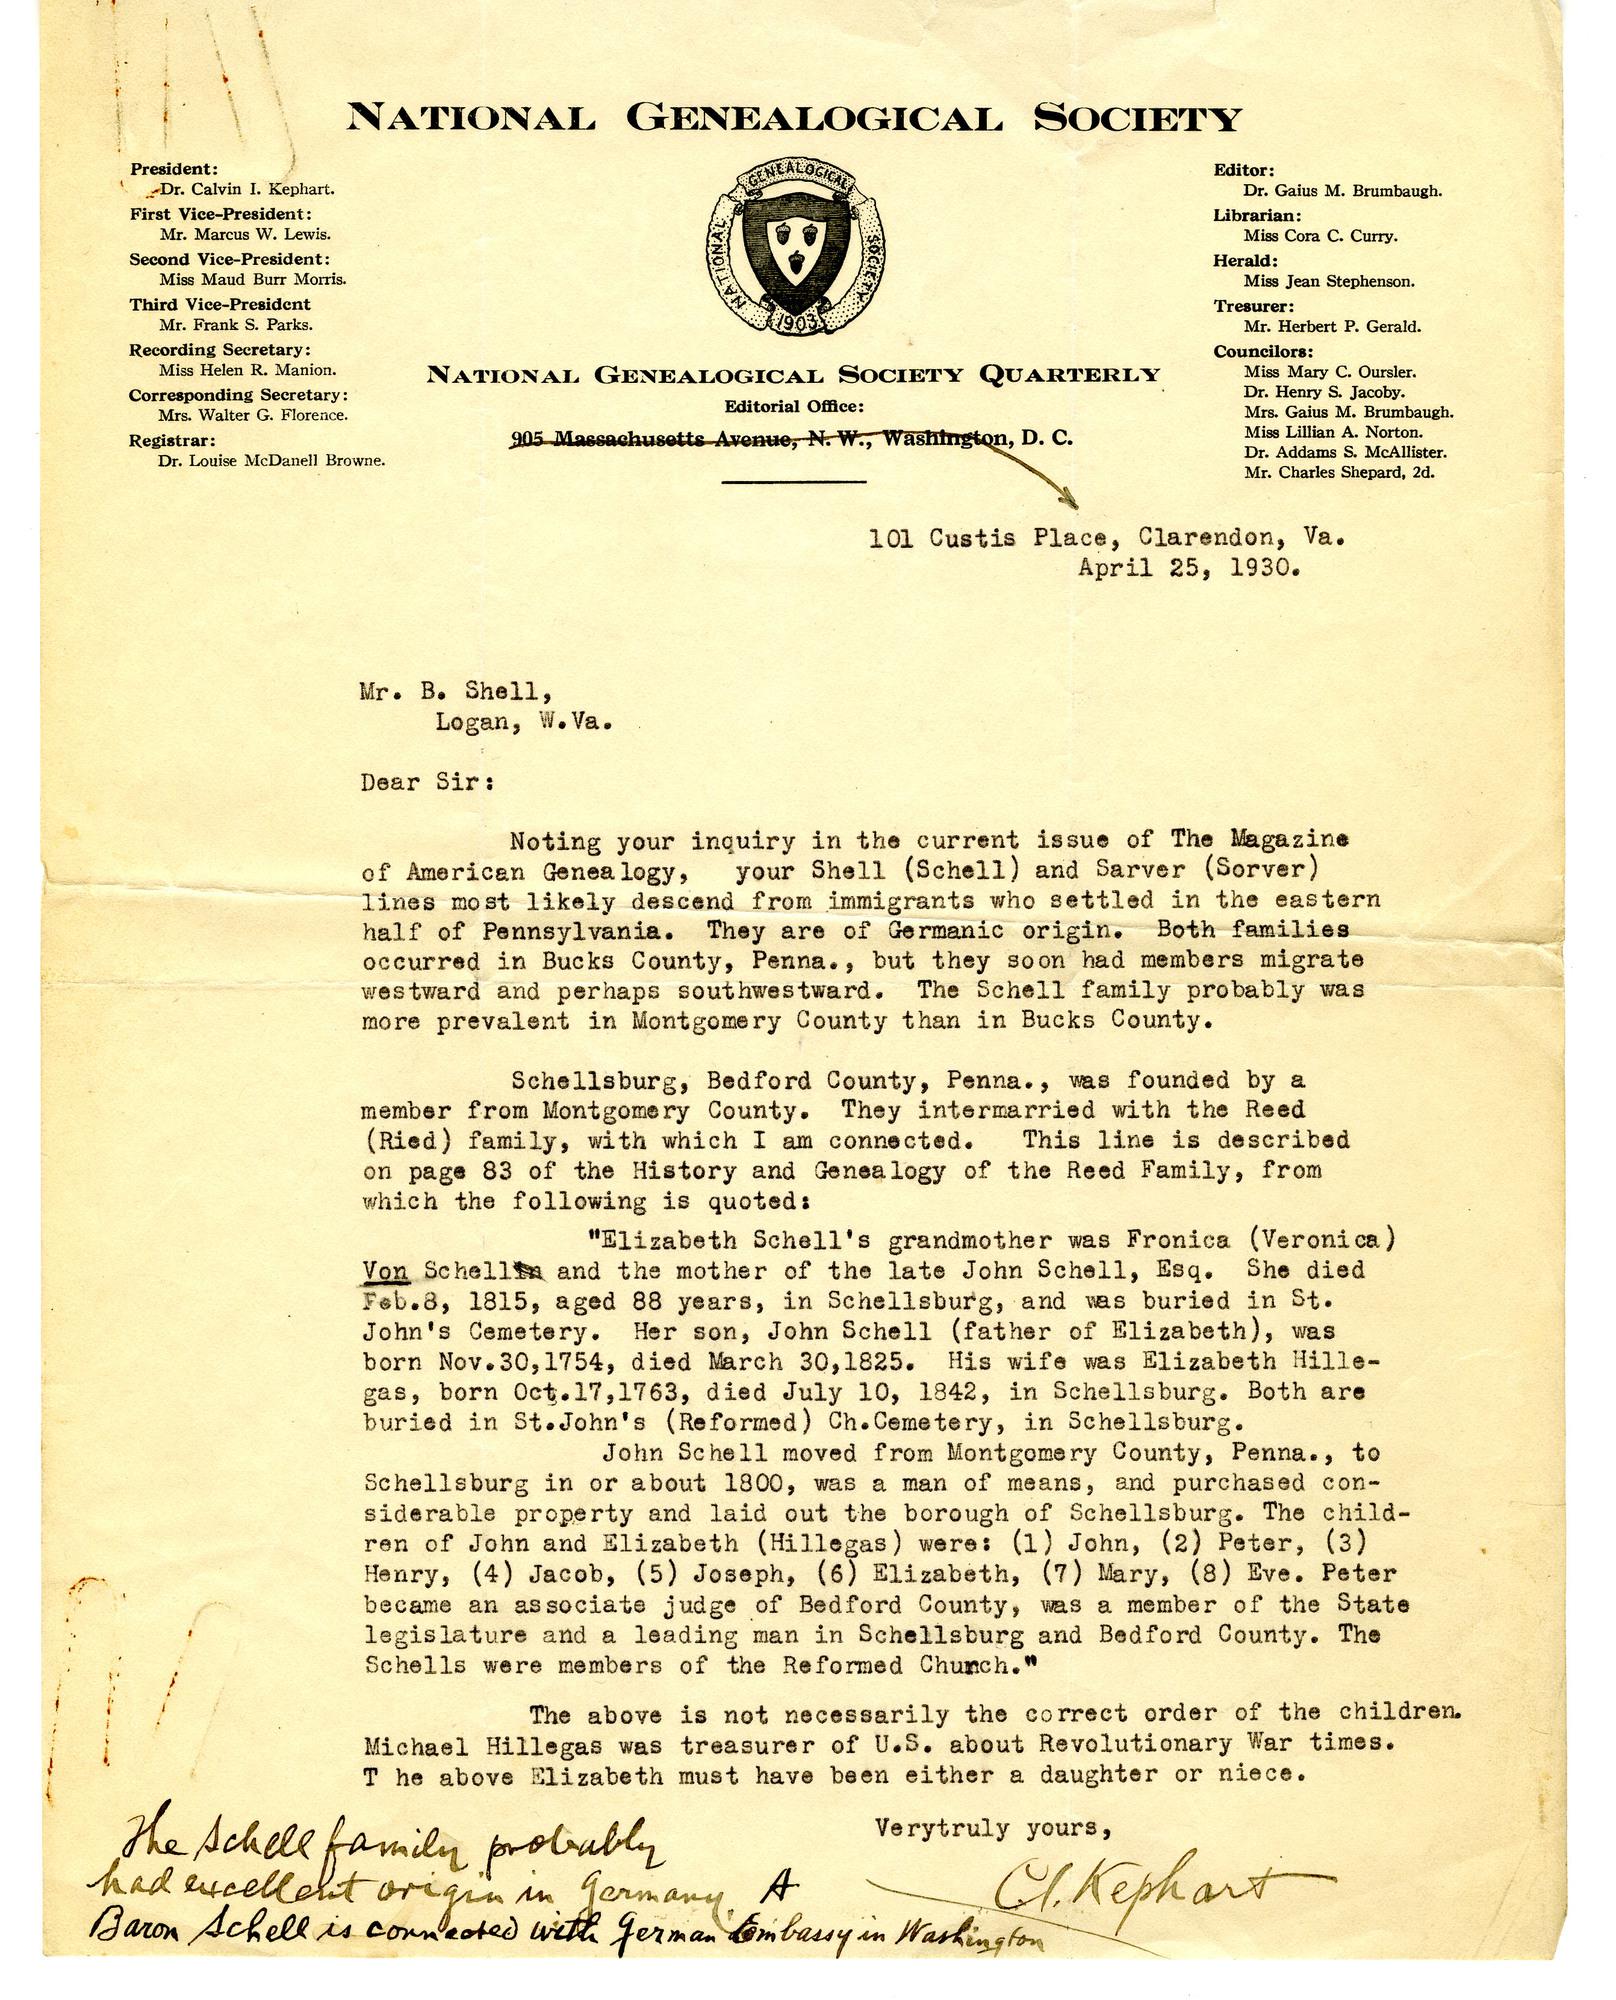 Ms1959_001_Letter_April25_1930.jpg